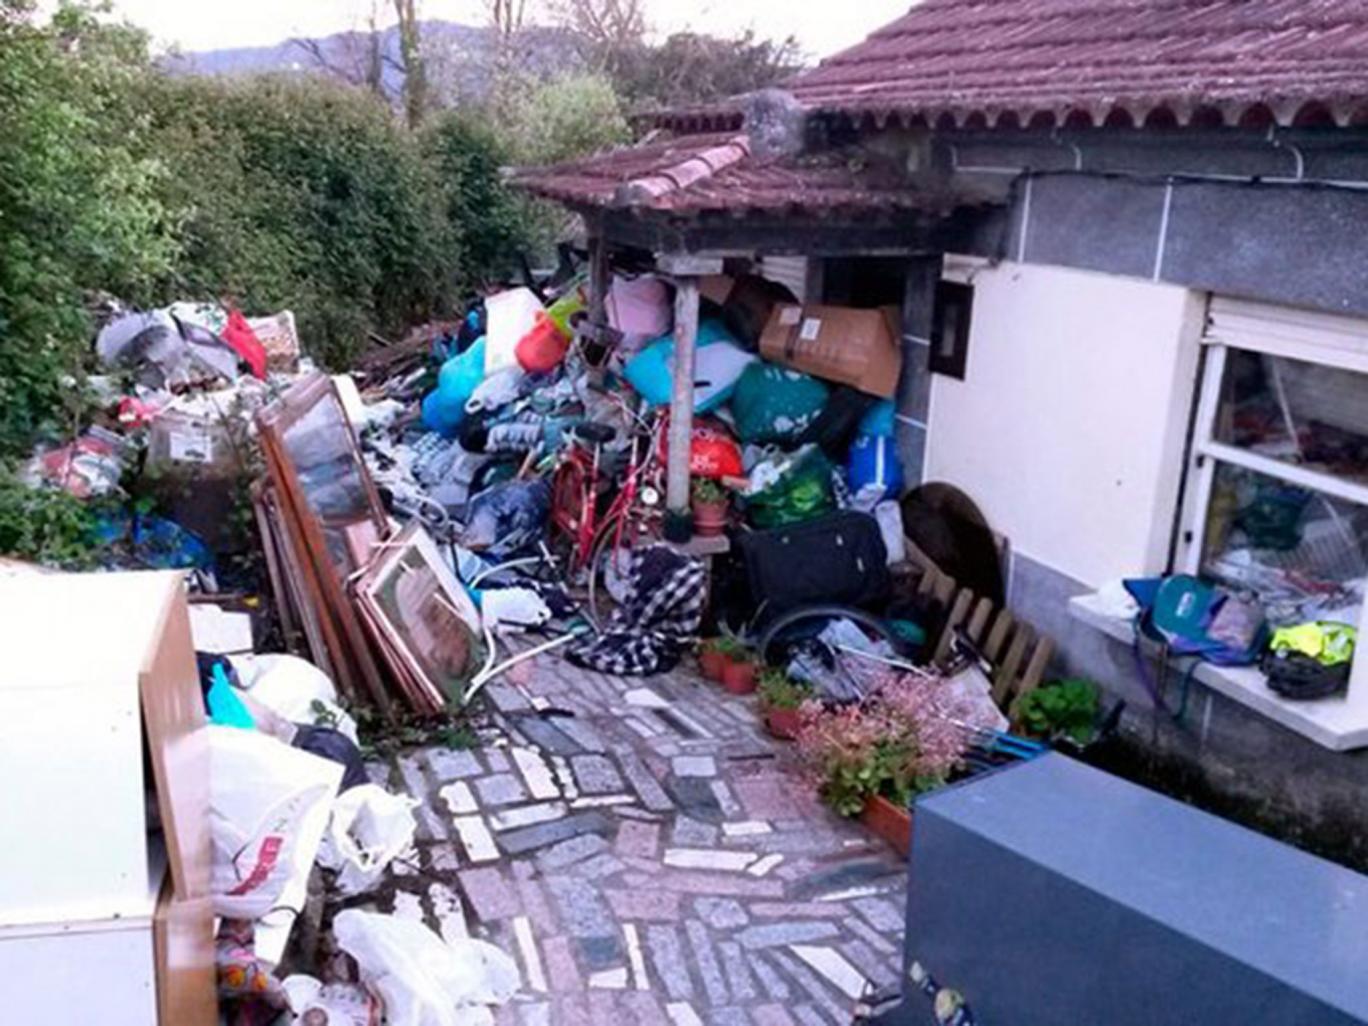 Outside the home,  Faro de Vigo/J Lores